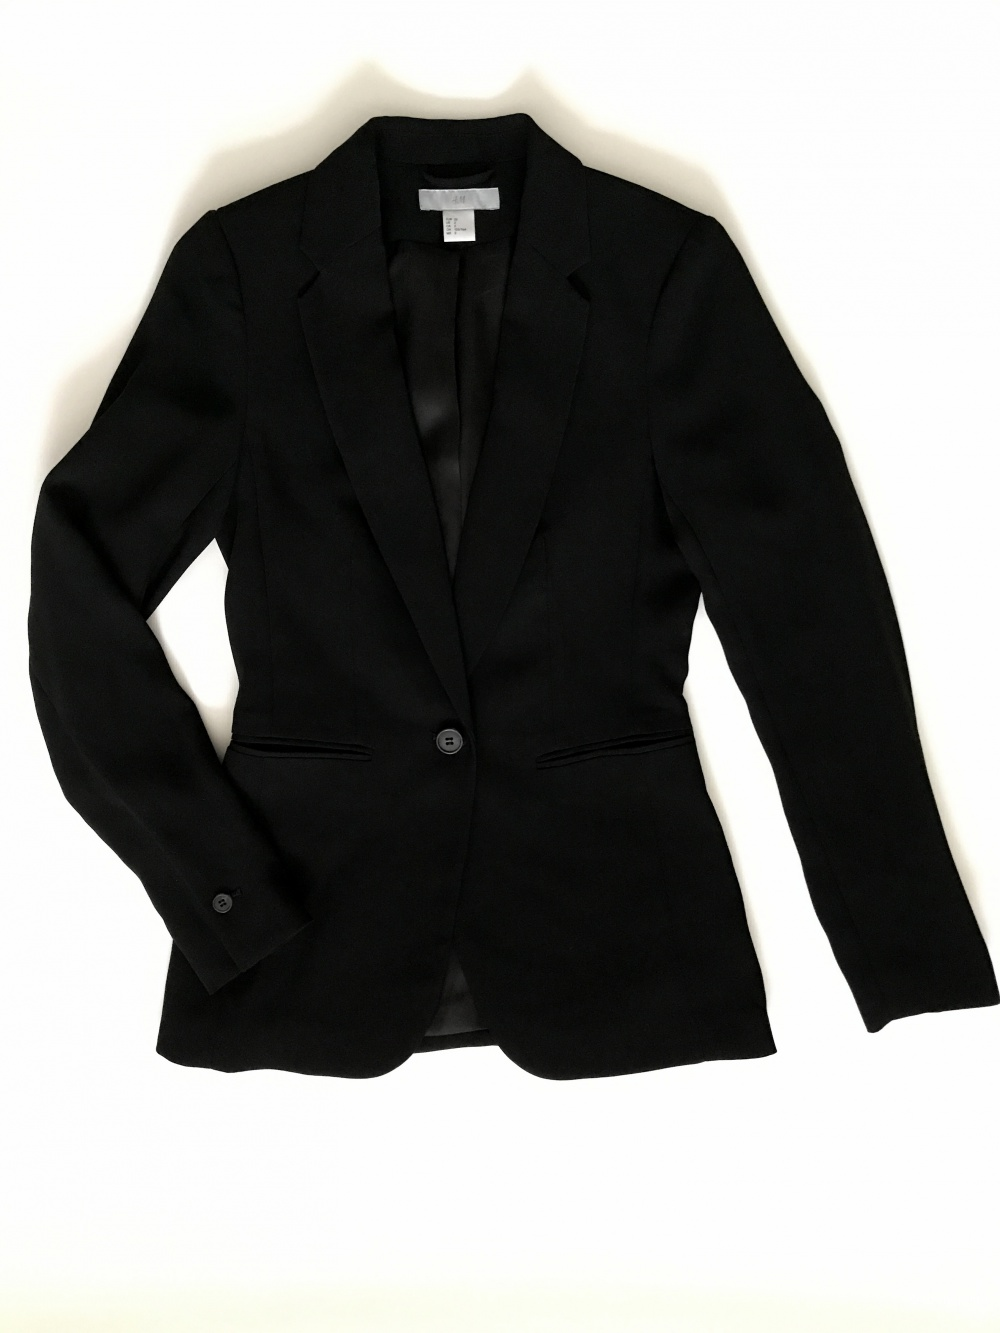 Жакет H&M черный, размер 32